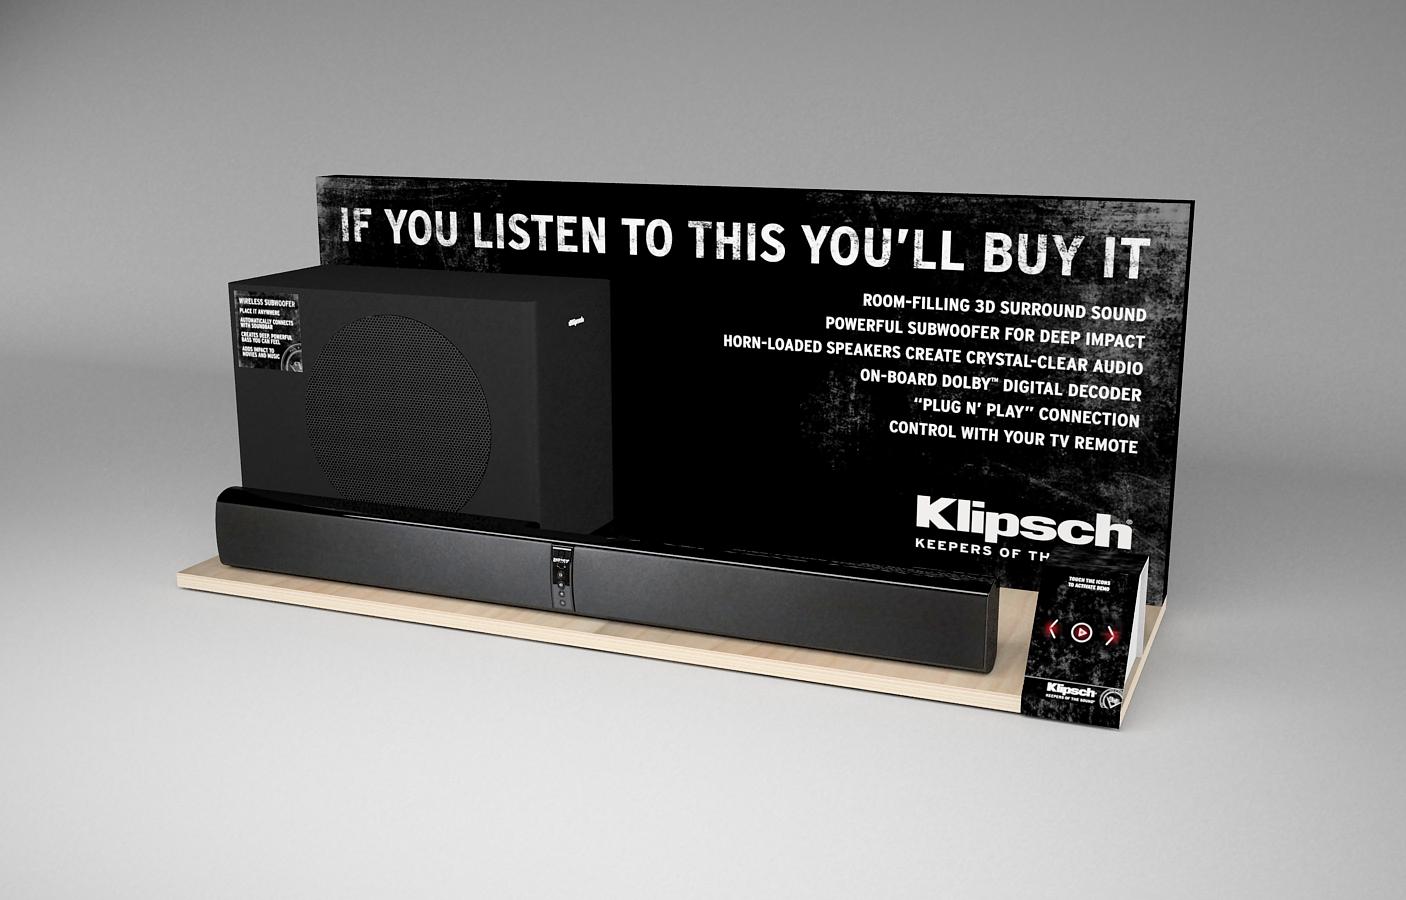 Klipsch Soundbar Display 03-11-14 3.jpg